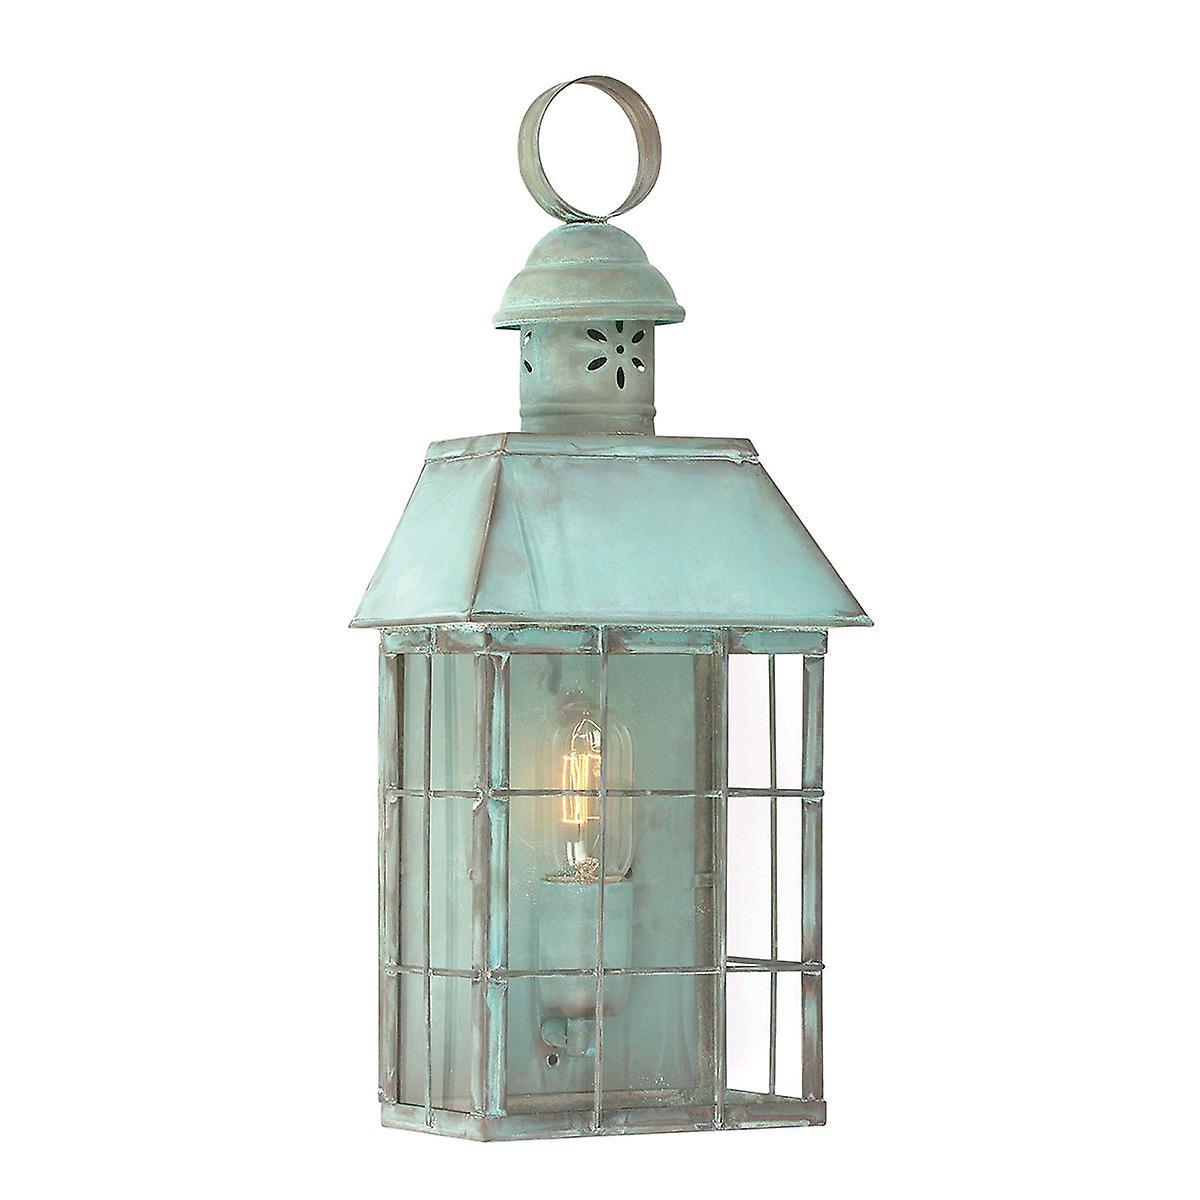 Hyde Park Wall Lantern Verdi  - Elstead Lighting